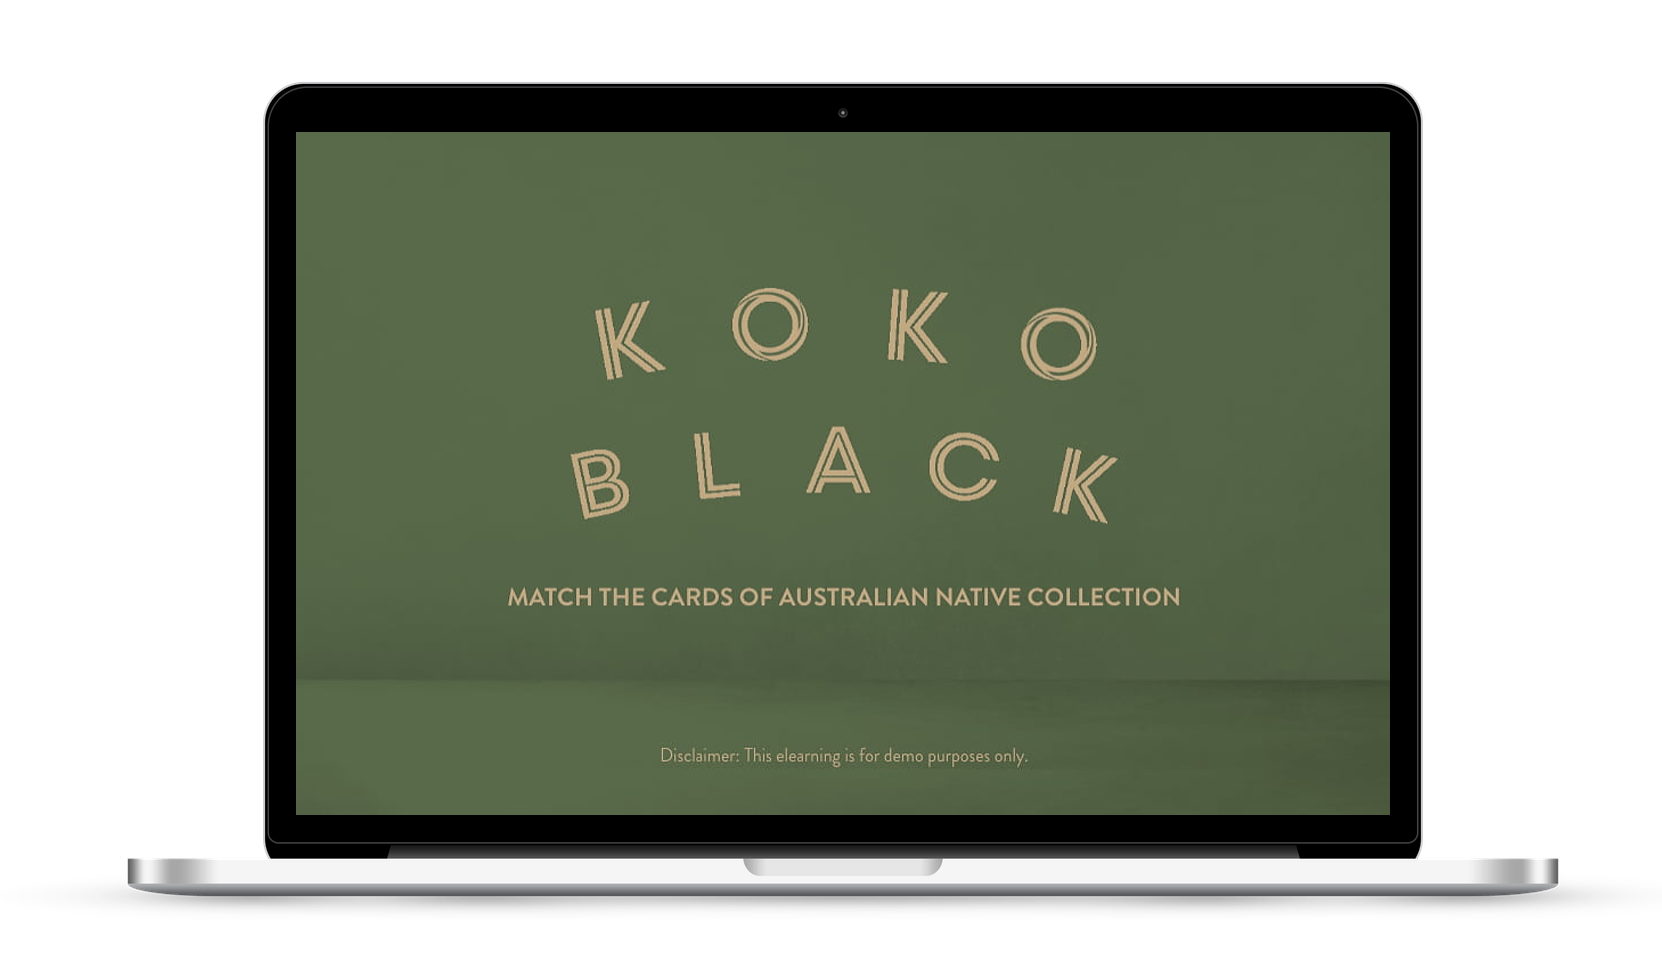 Koko black interactive chocolate memory elearning game in Sydney